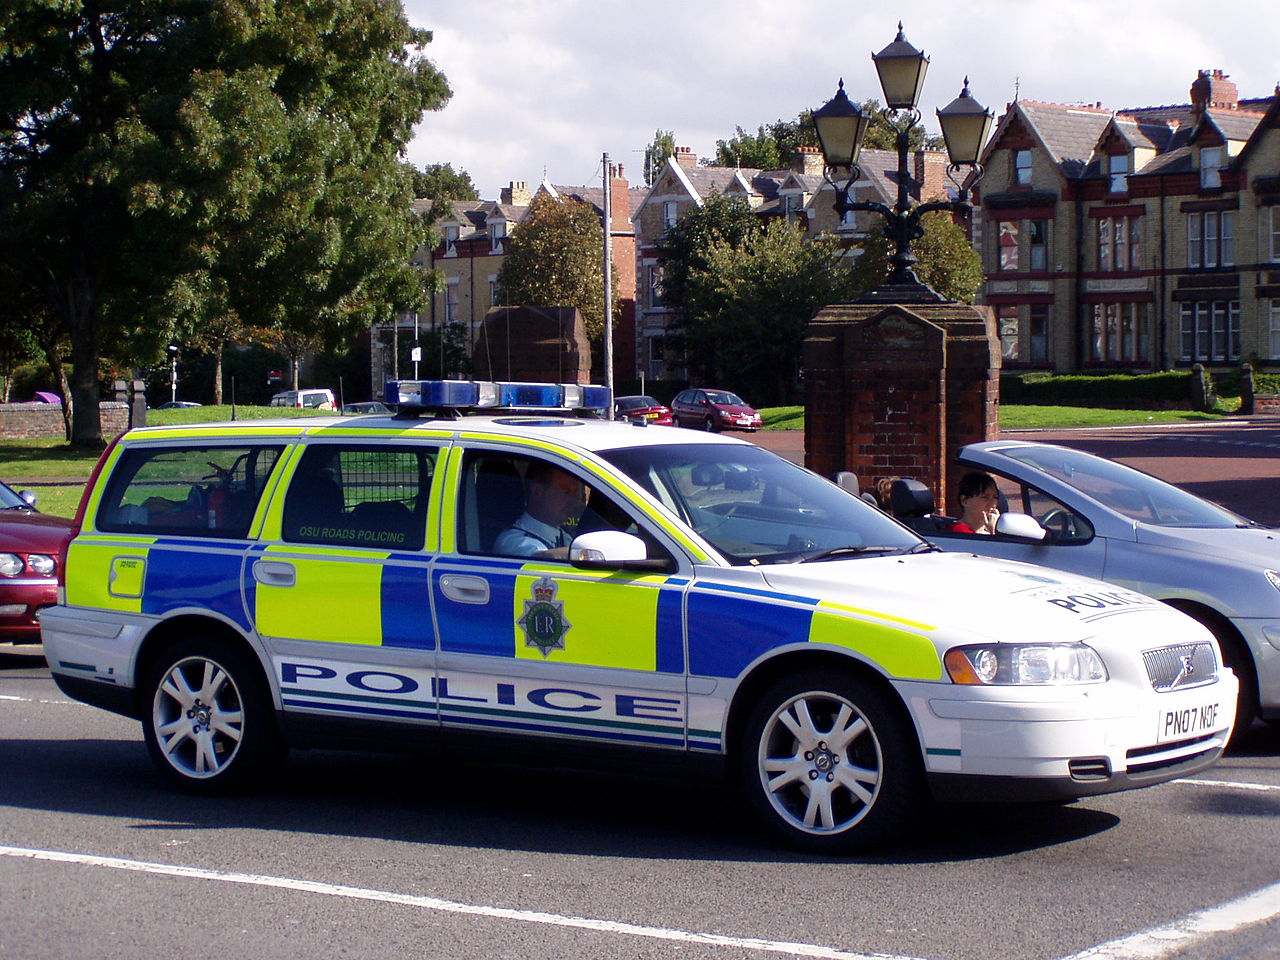 Merseyside Police Volvo.jpg